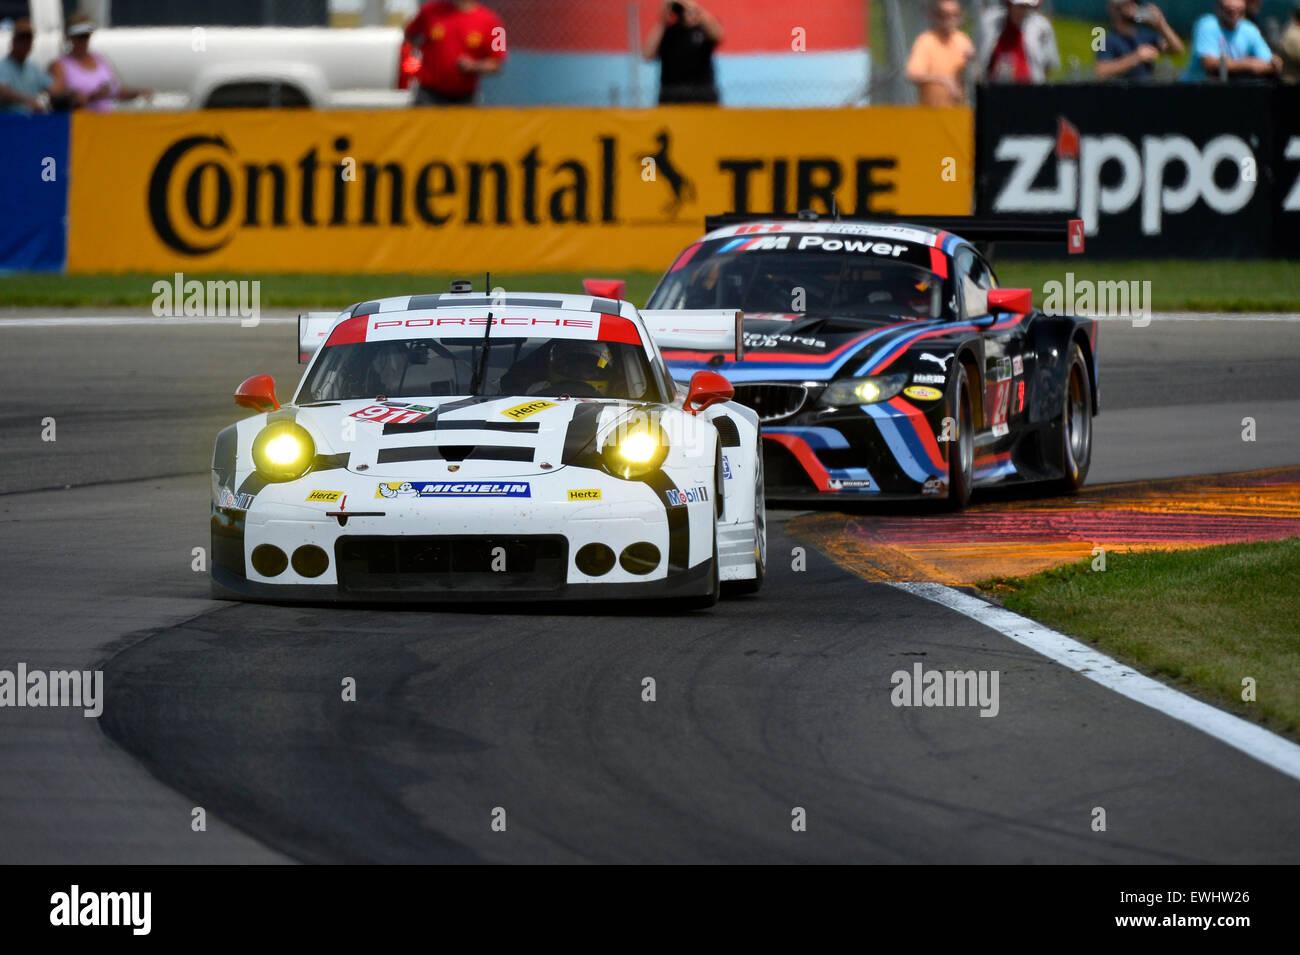 March 14, 2015 - Watkins Glen, NY, U.S. - Watkins Glen, NY - Jun 26, 2015: The Porsche North America races through Stock Photo